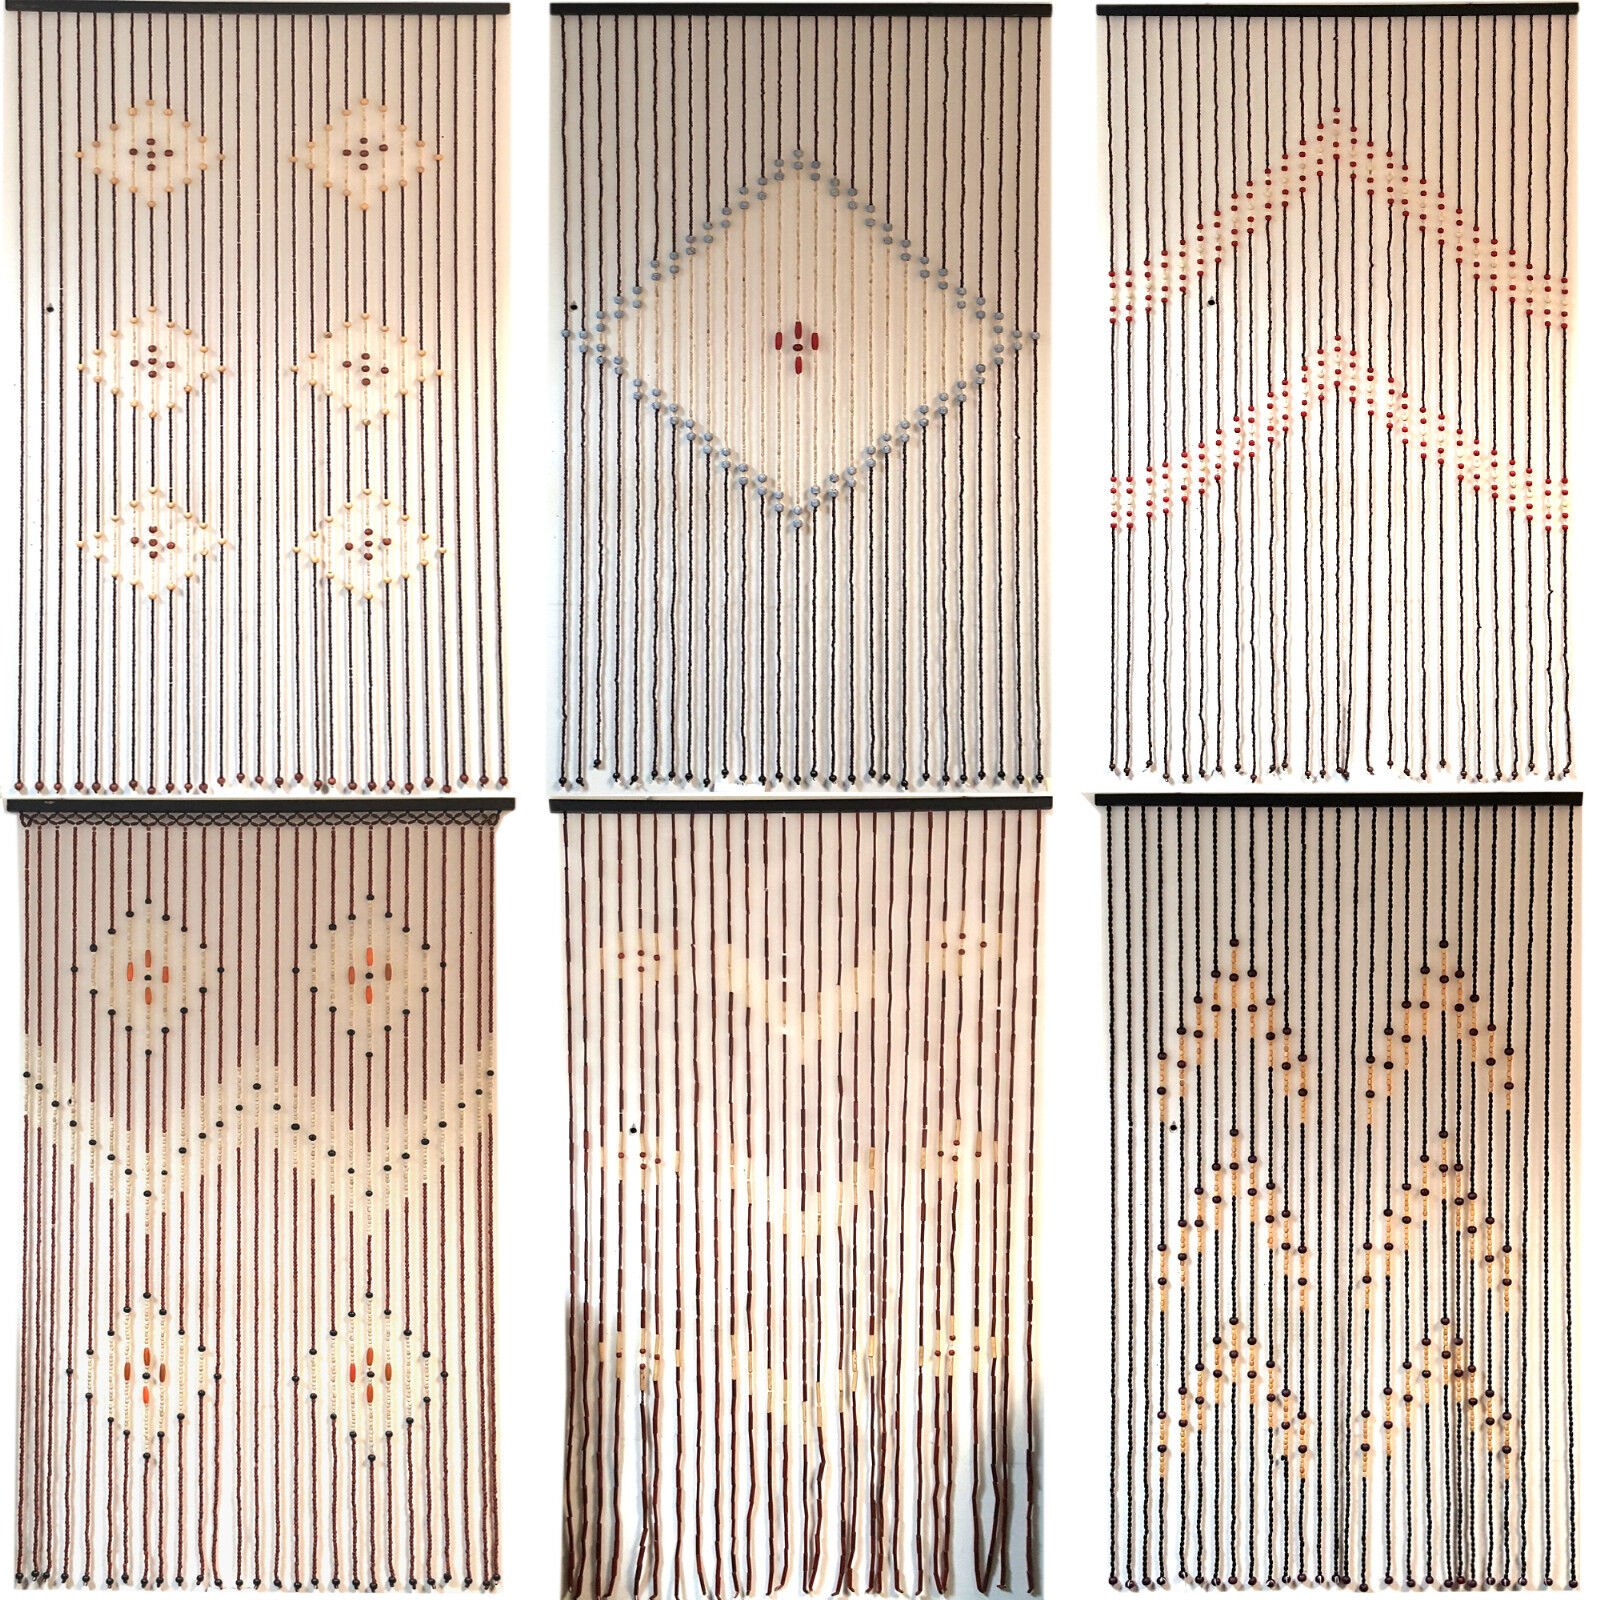 Bamboo bead door curtain - Top Quality Bamboo Beaded Door Curtains Blinds Fly Insects Door Curtain Wooden Ebay